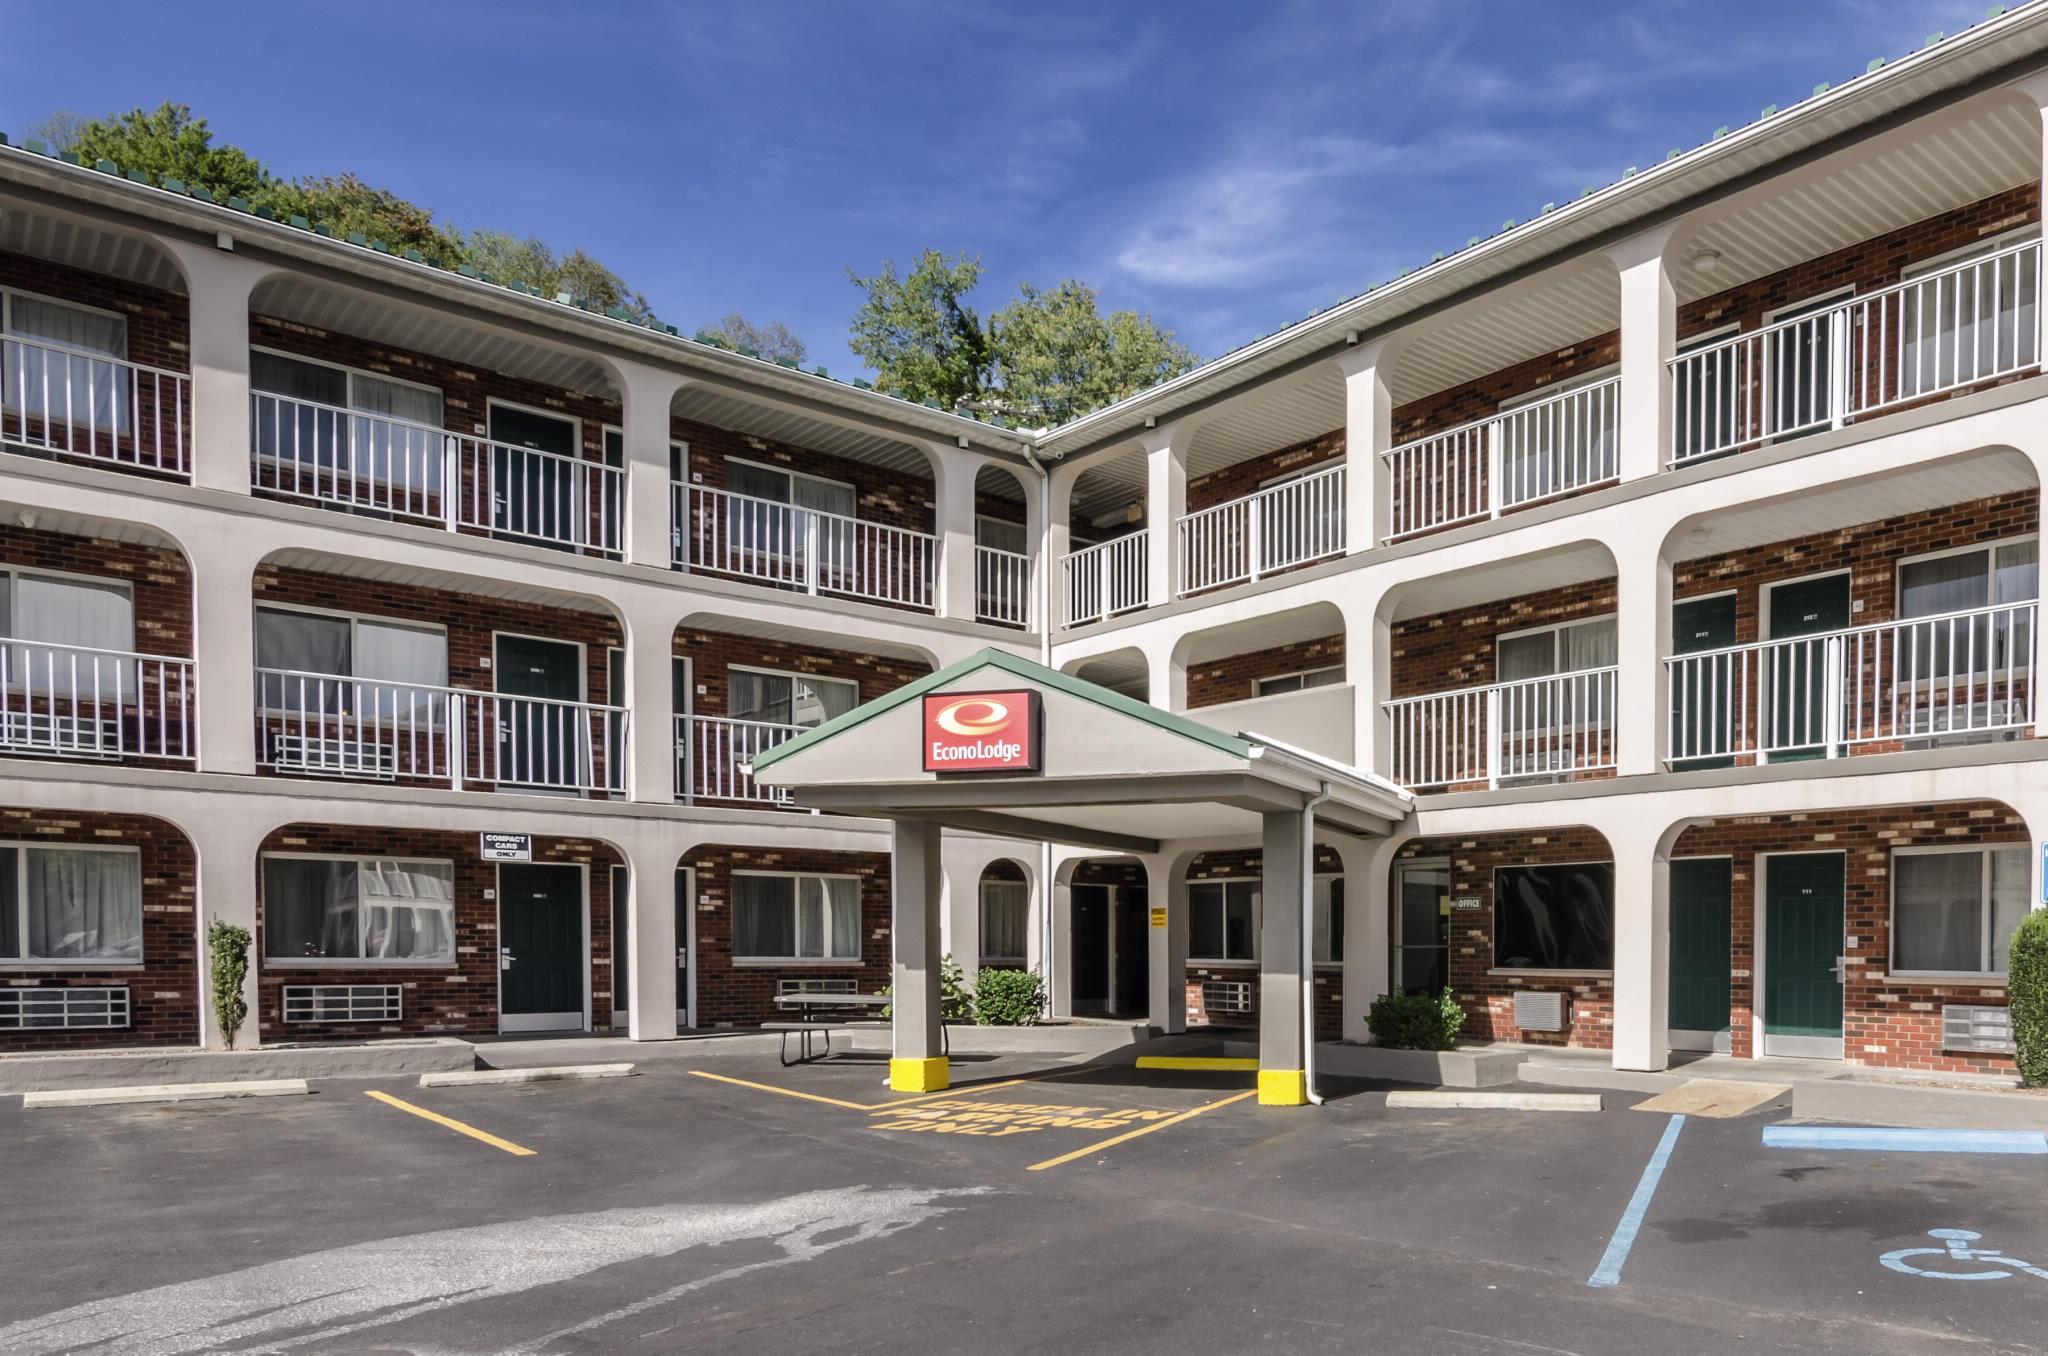 Pet Friendly Hotels Near Summersville Wv